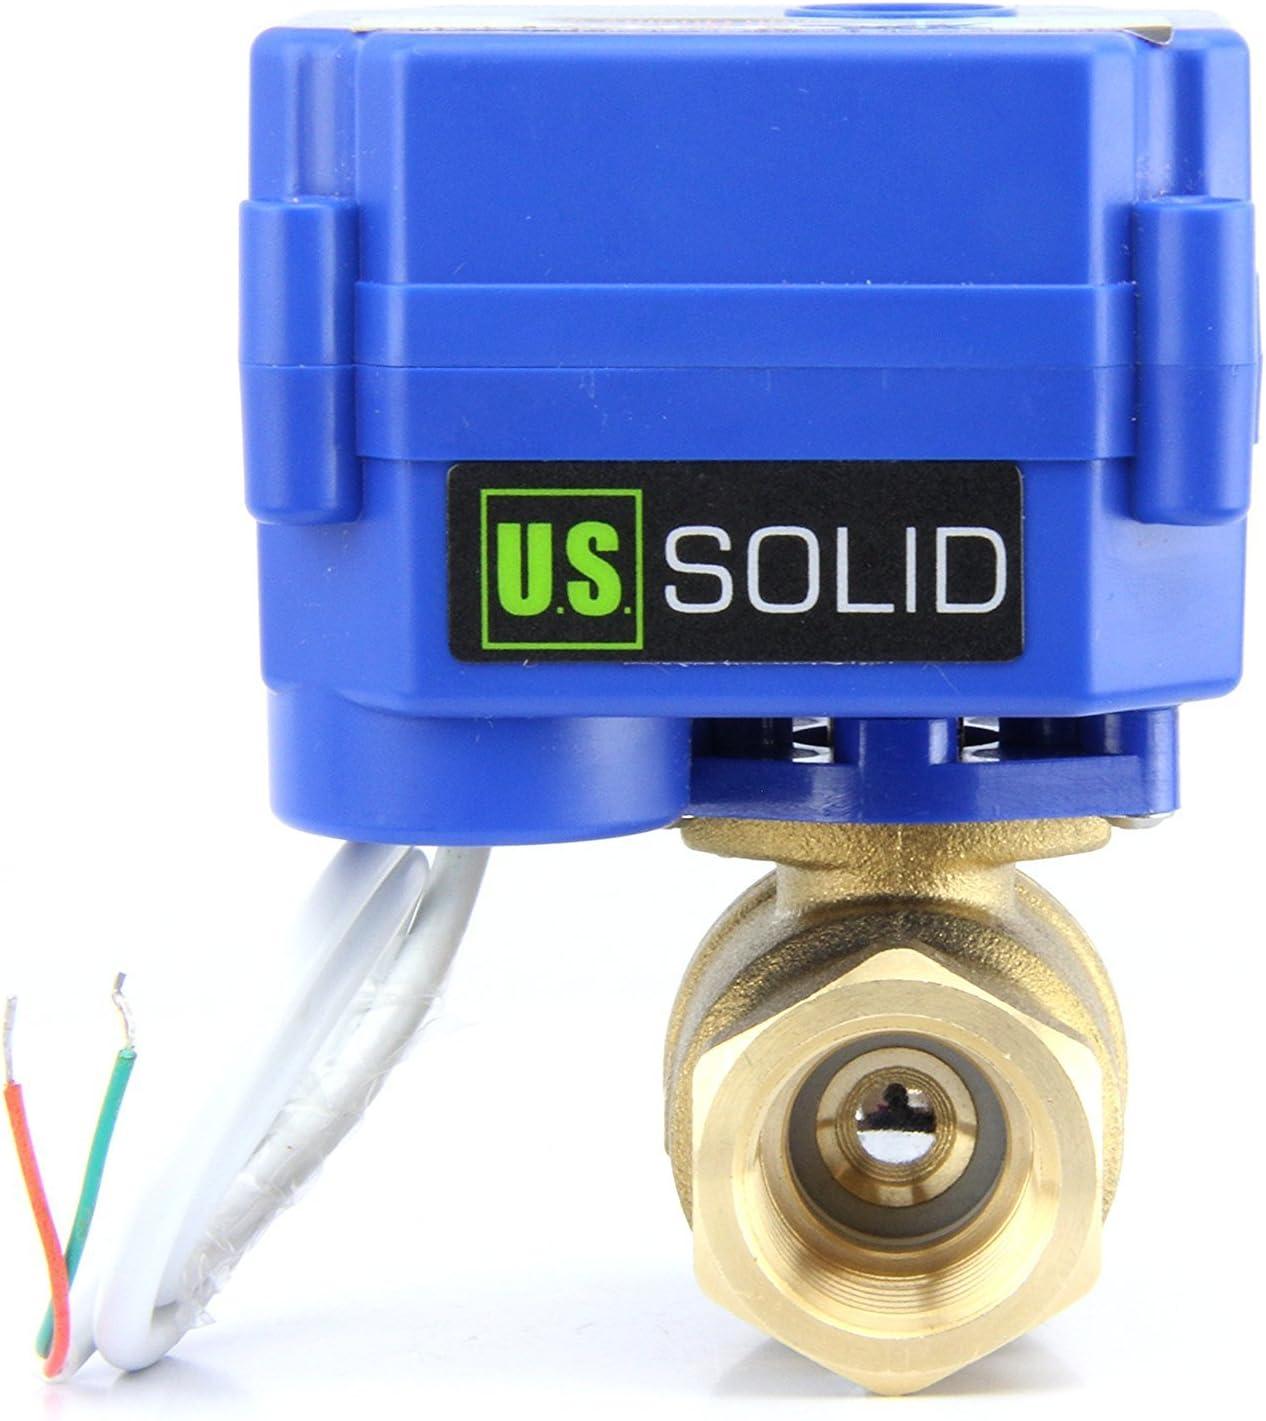 U.S. Solid 3/4